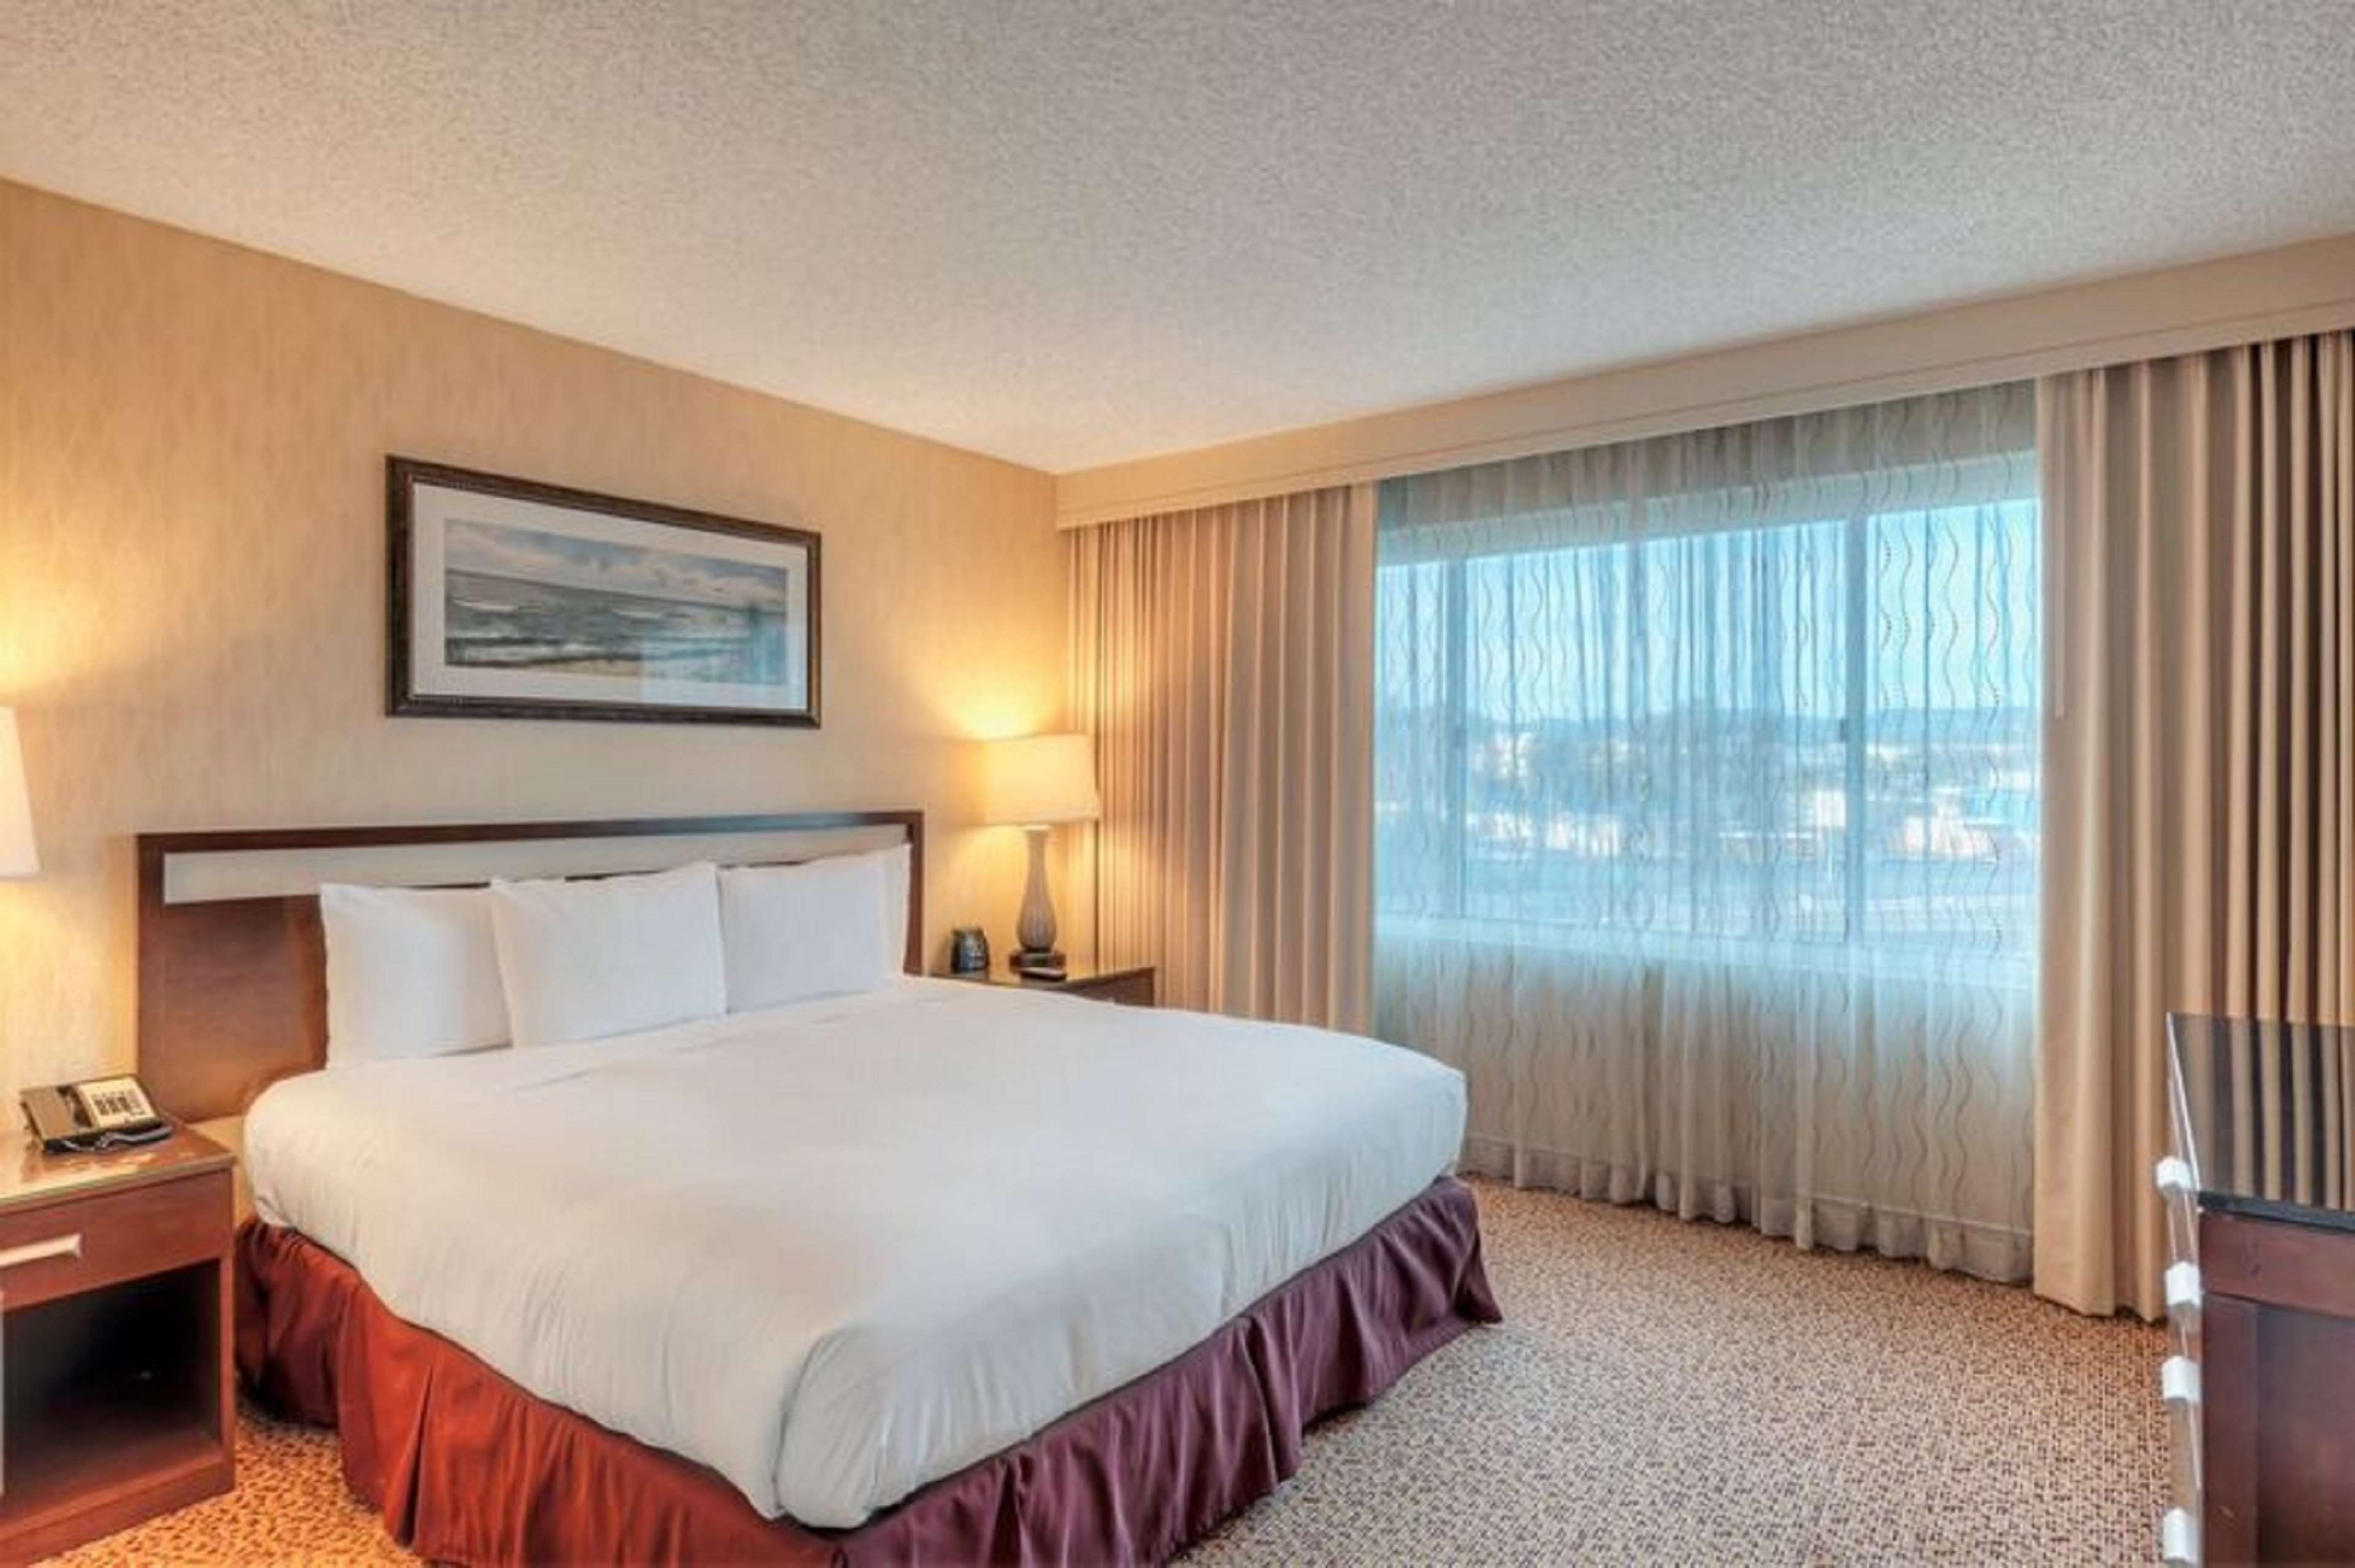 DoubleTree Suites by Hilton Hotel Santa Monica image 8